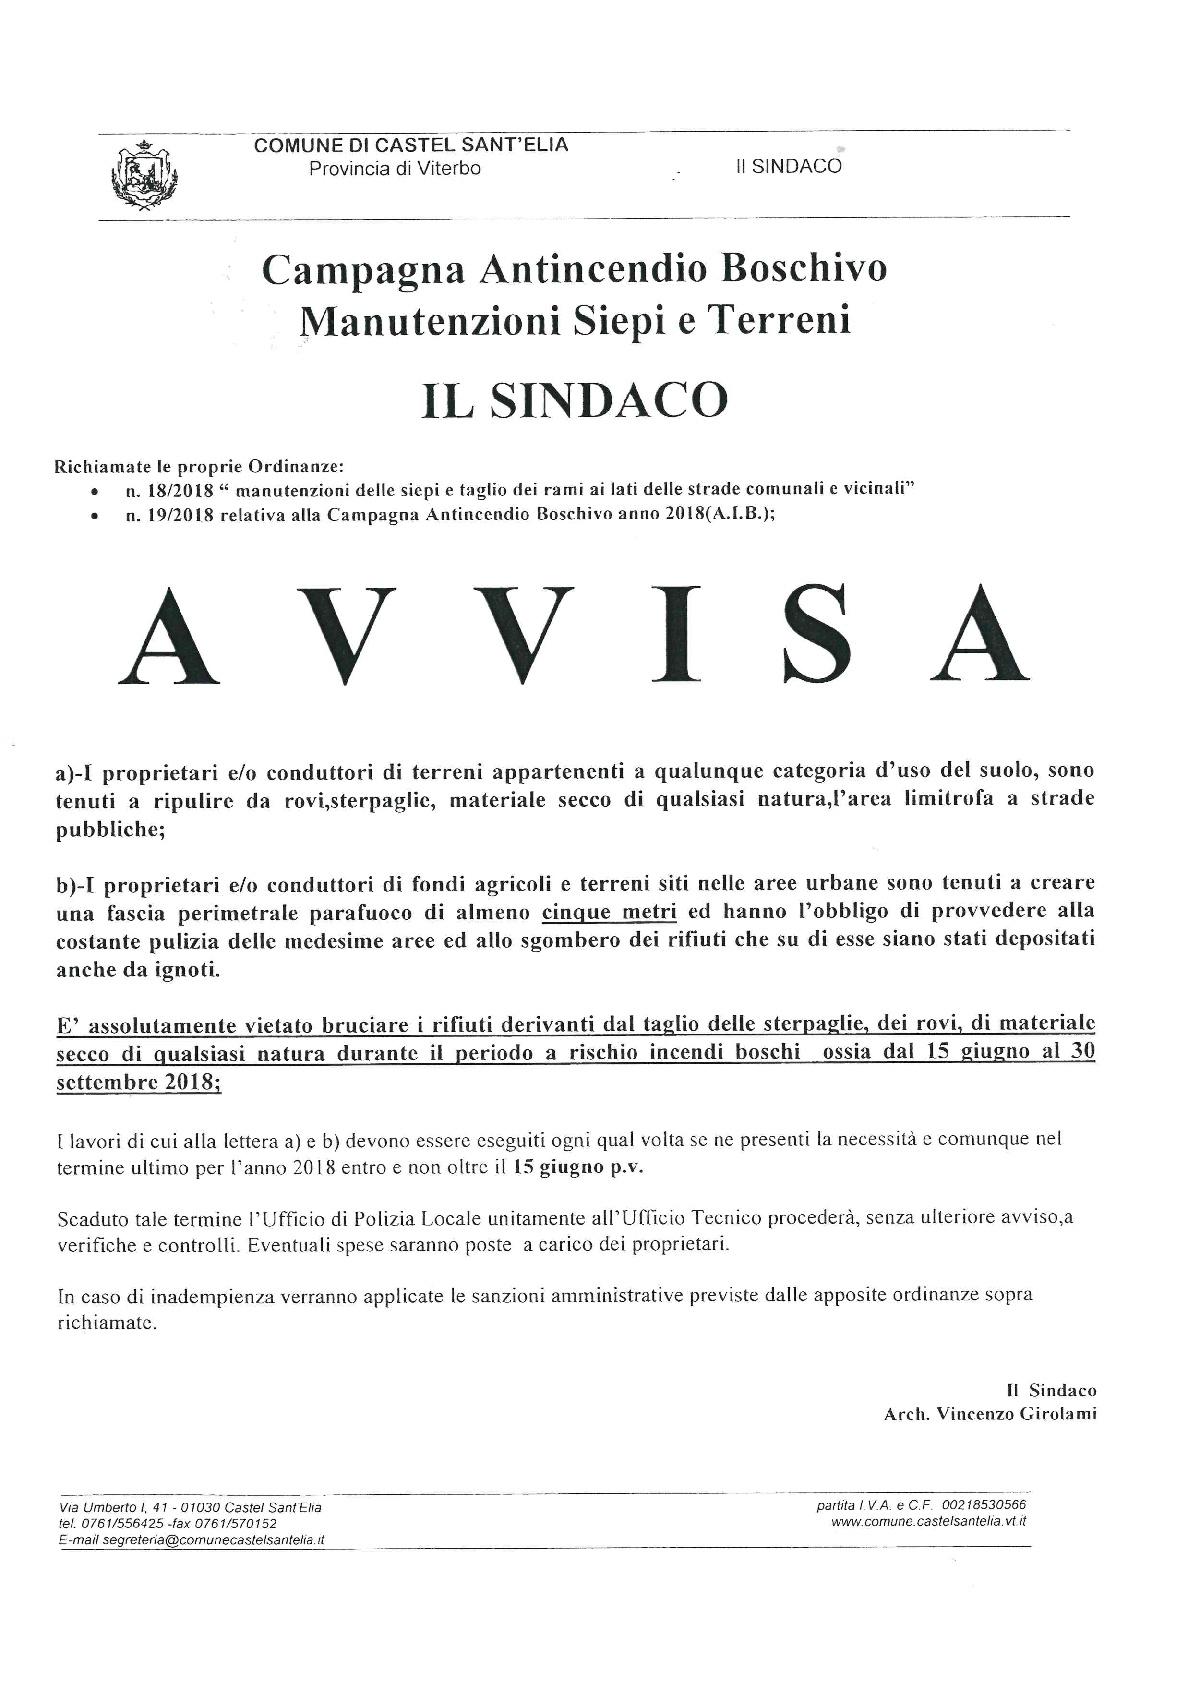 AVVISO CAMPAGNA ANTINCENDIO